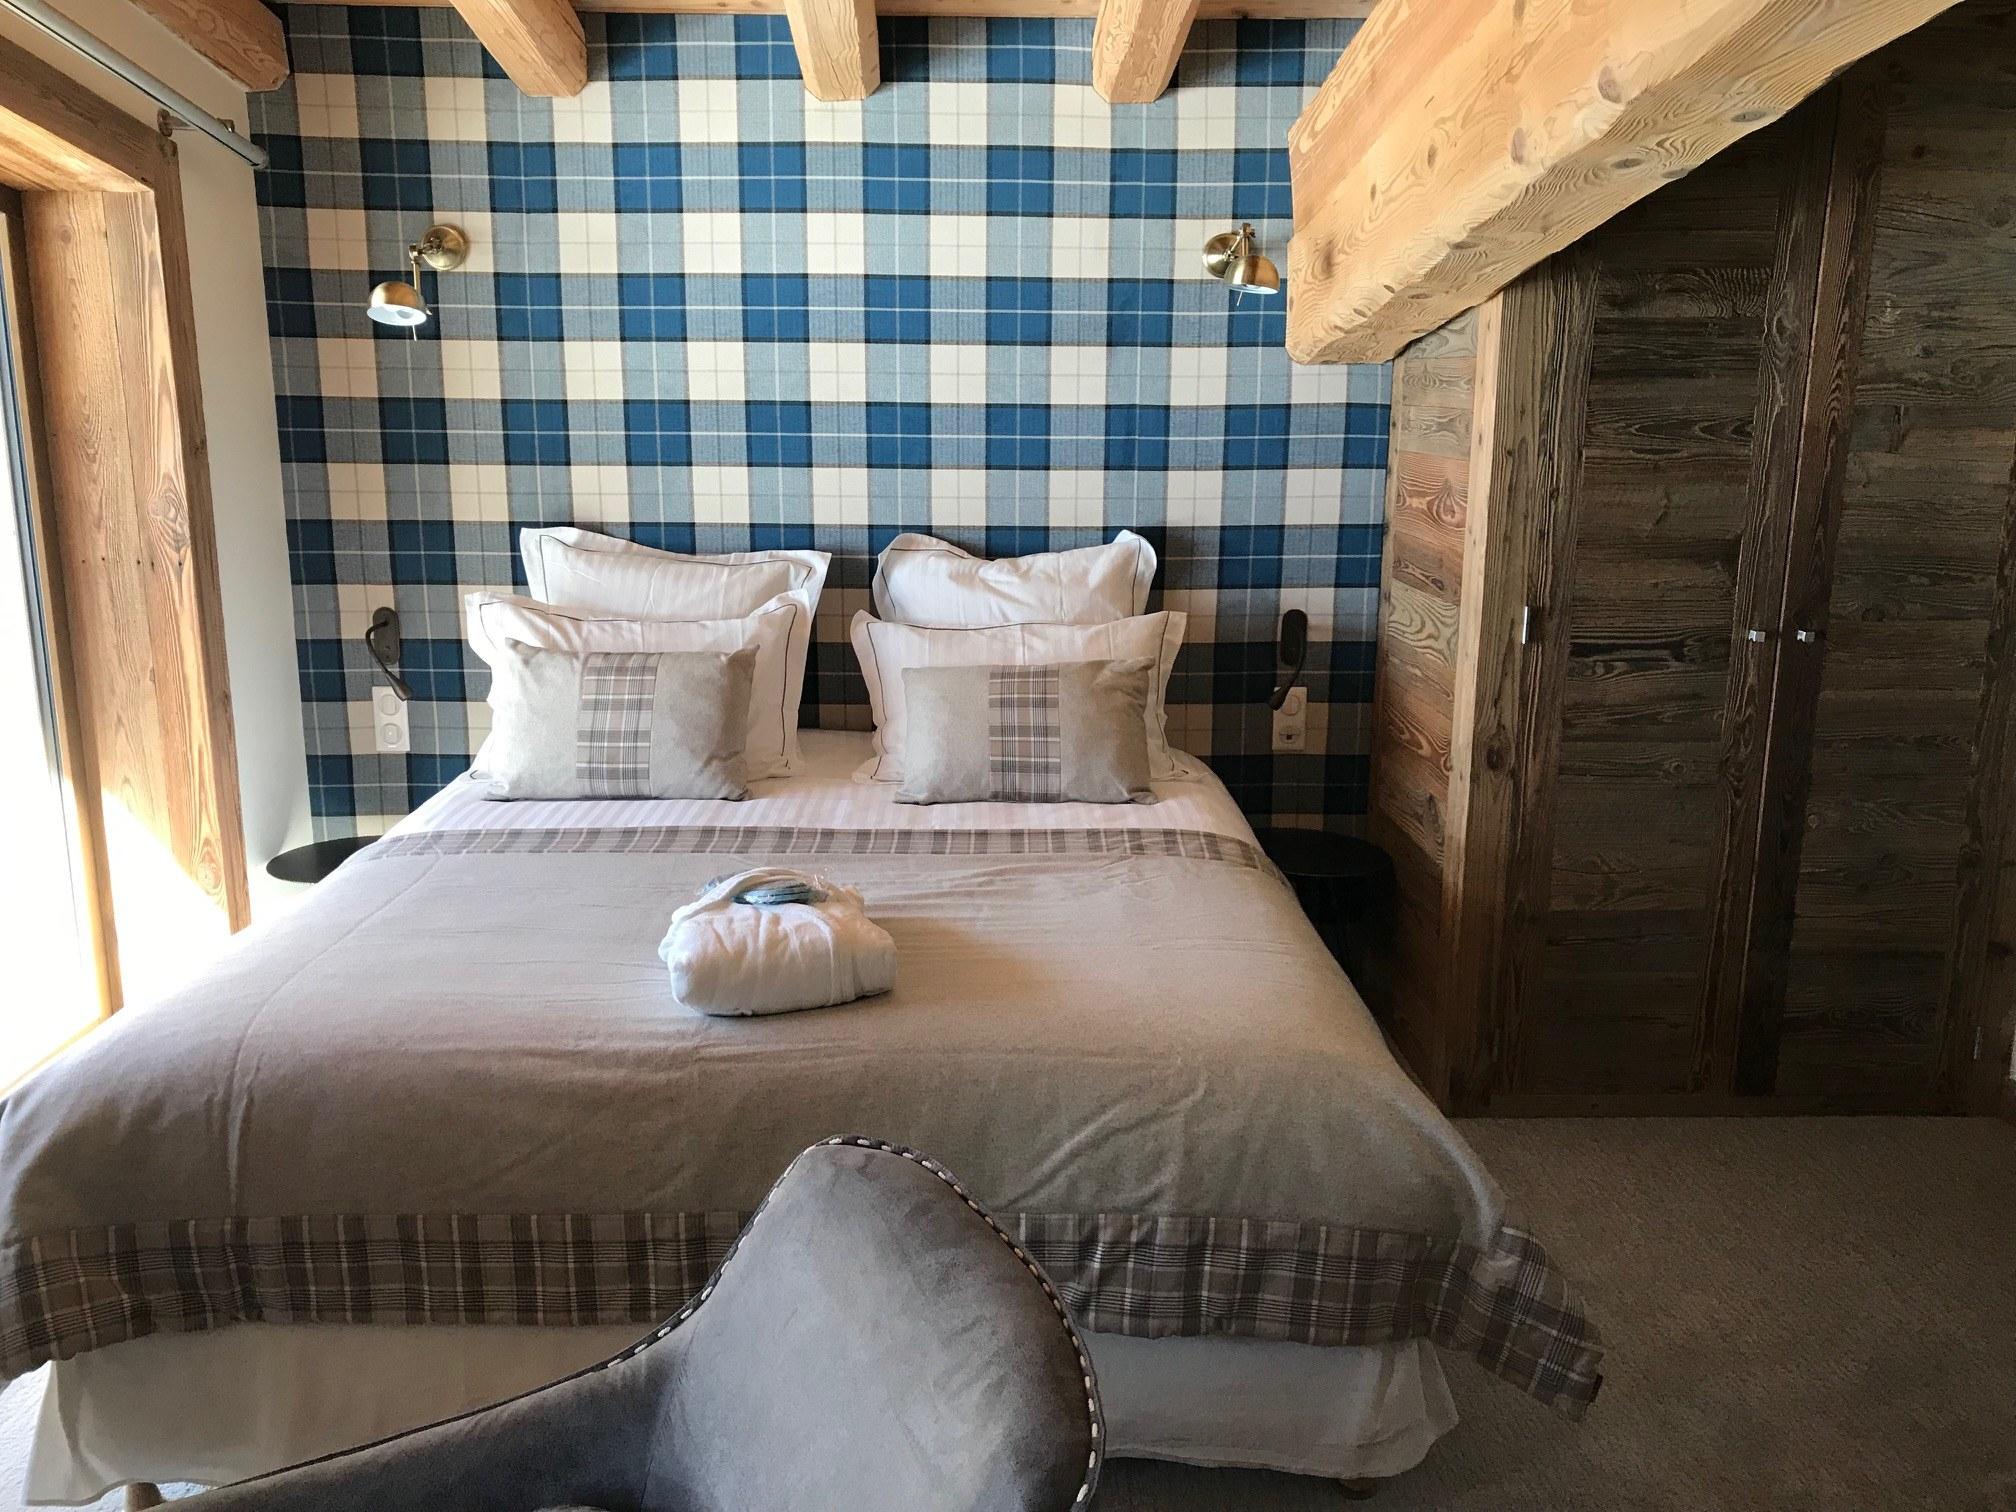 chambre-deluxe-thalia-hotel-bas-des-pistes-val-isere